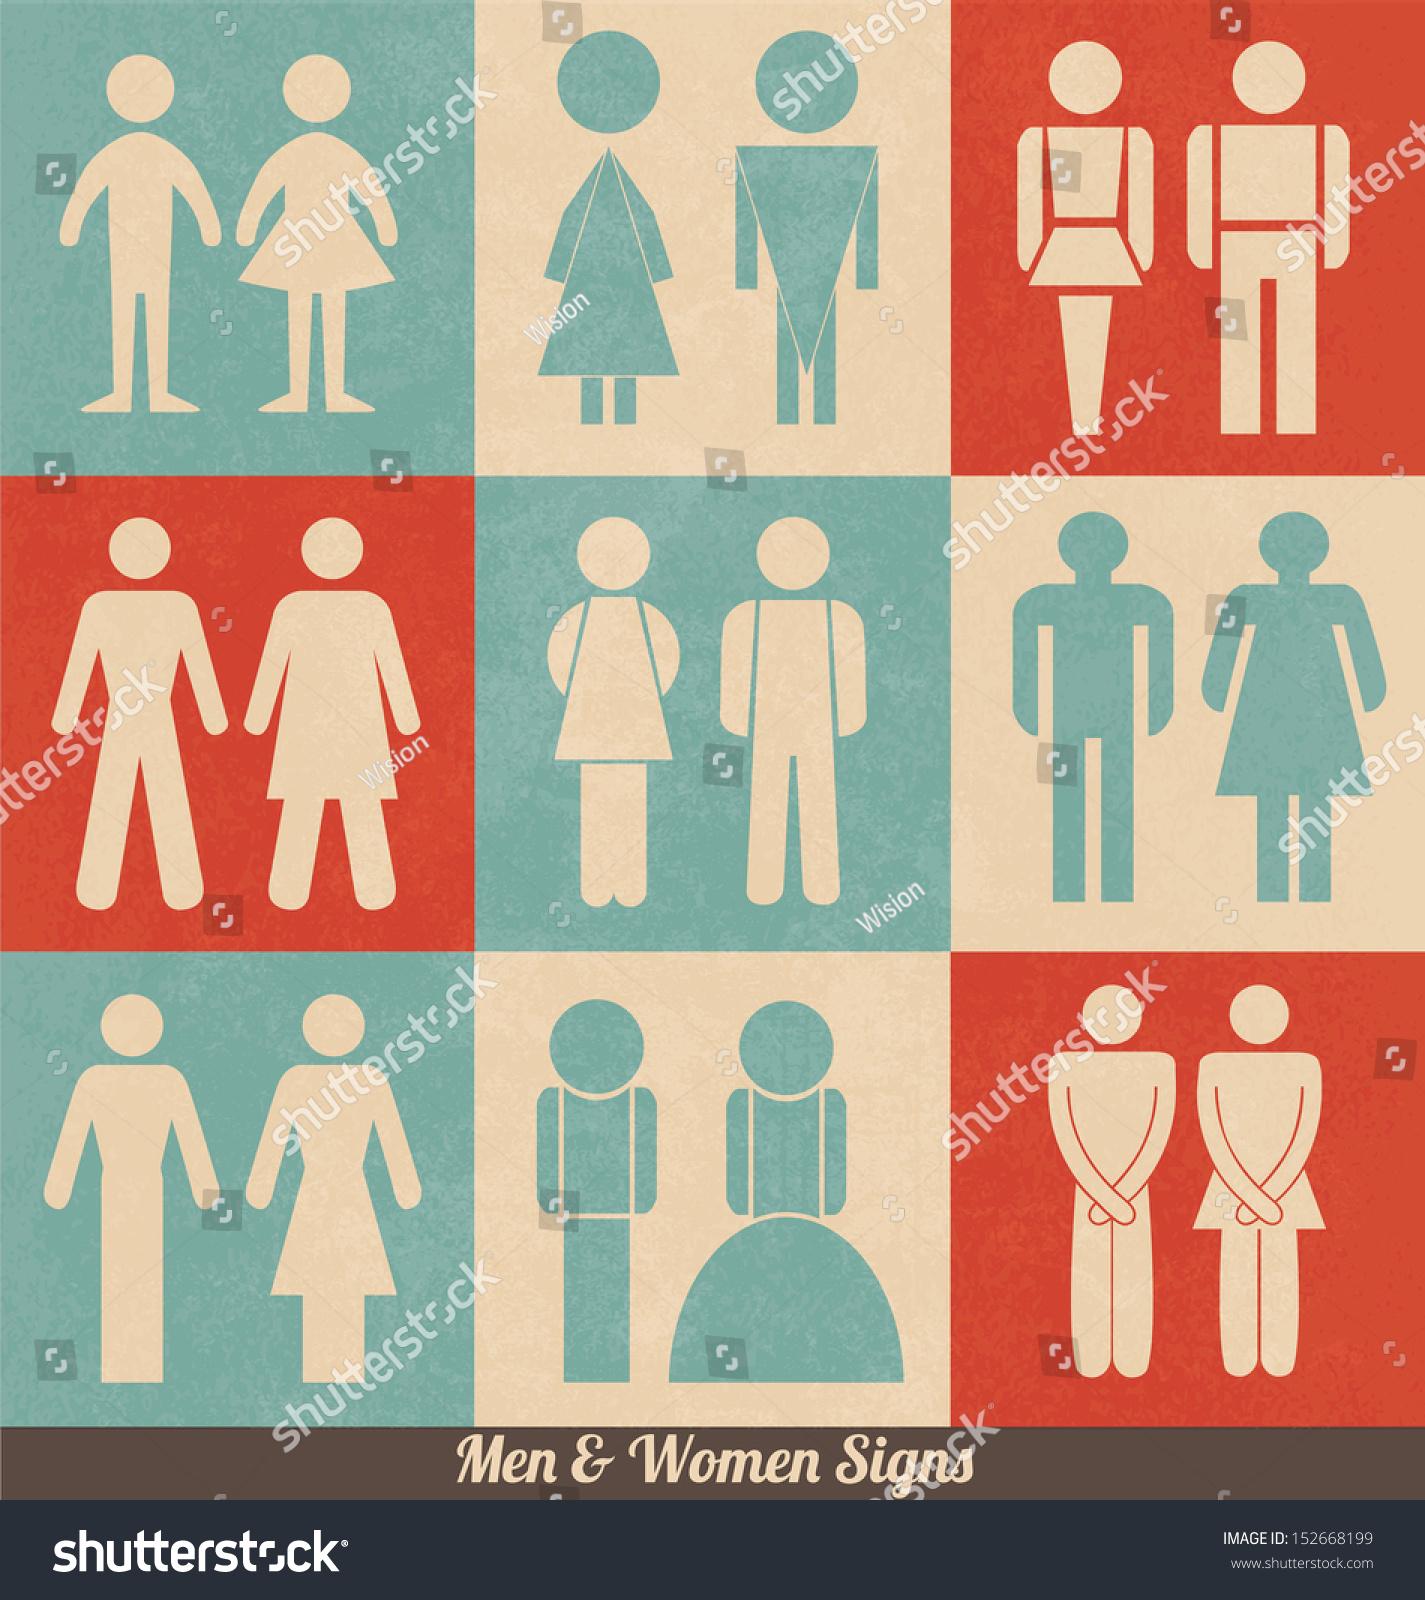 men women signs retro design wc stock vector 152668199 shutterstock. Black Bedroom Furniture Sets. Home Design Ideas